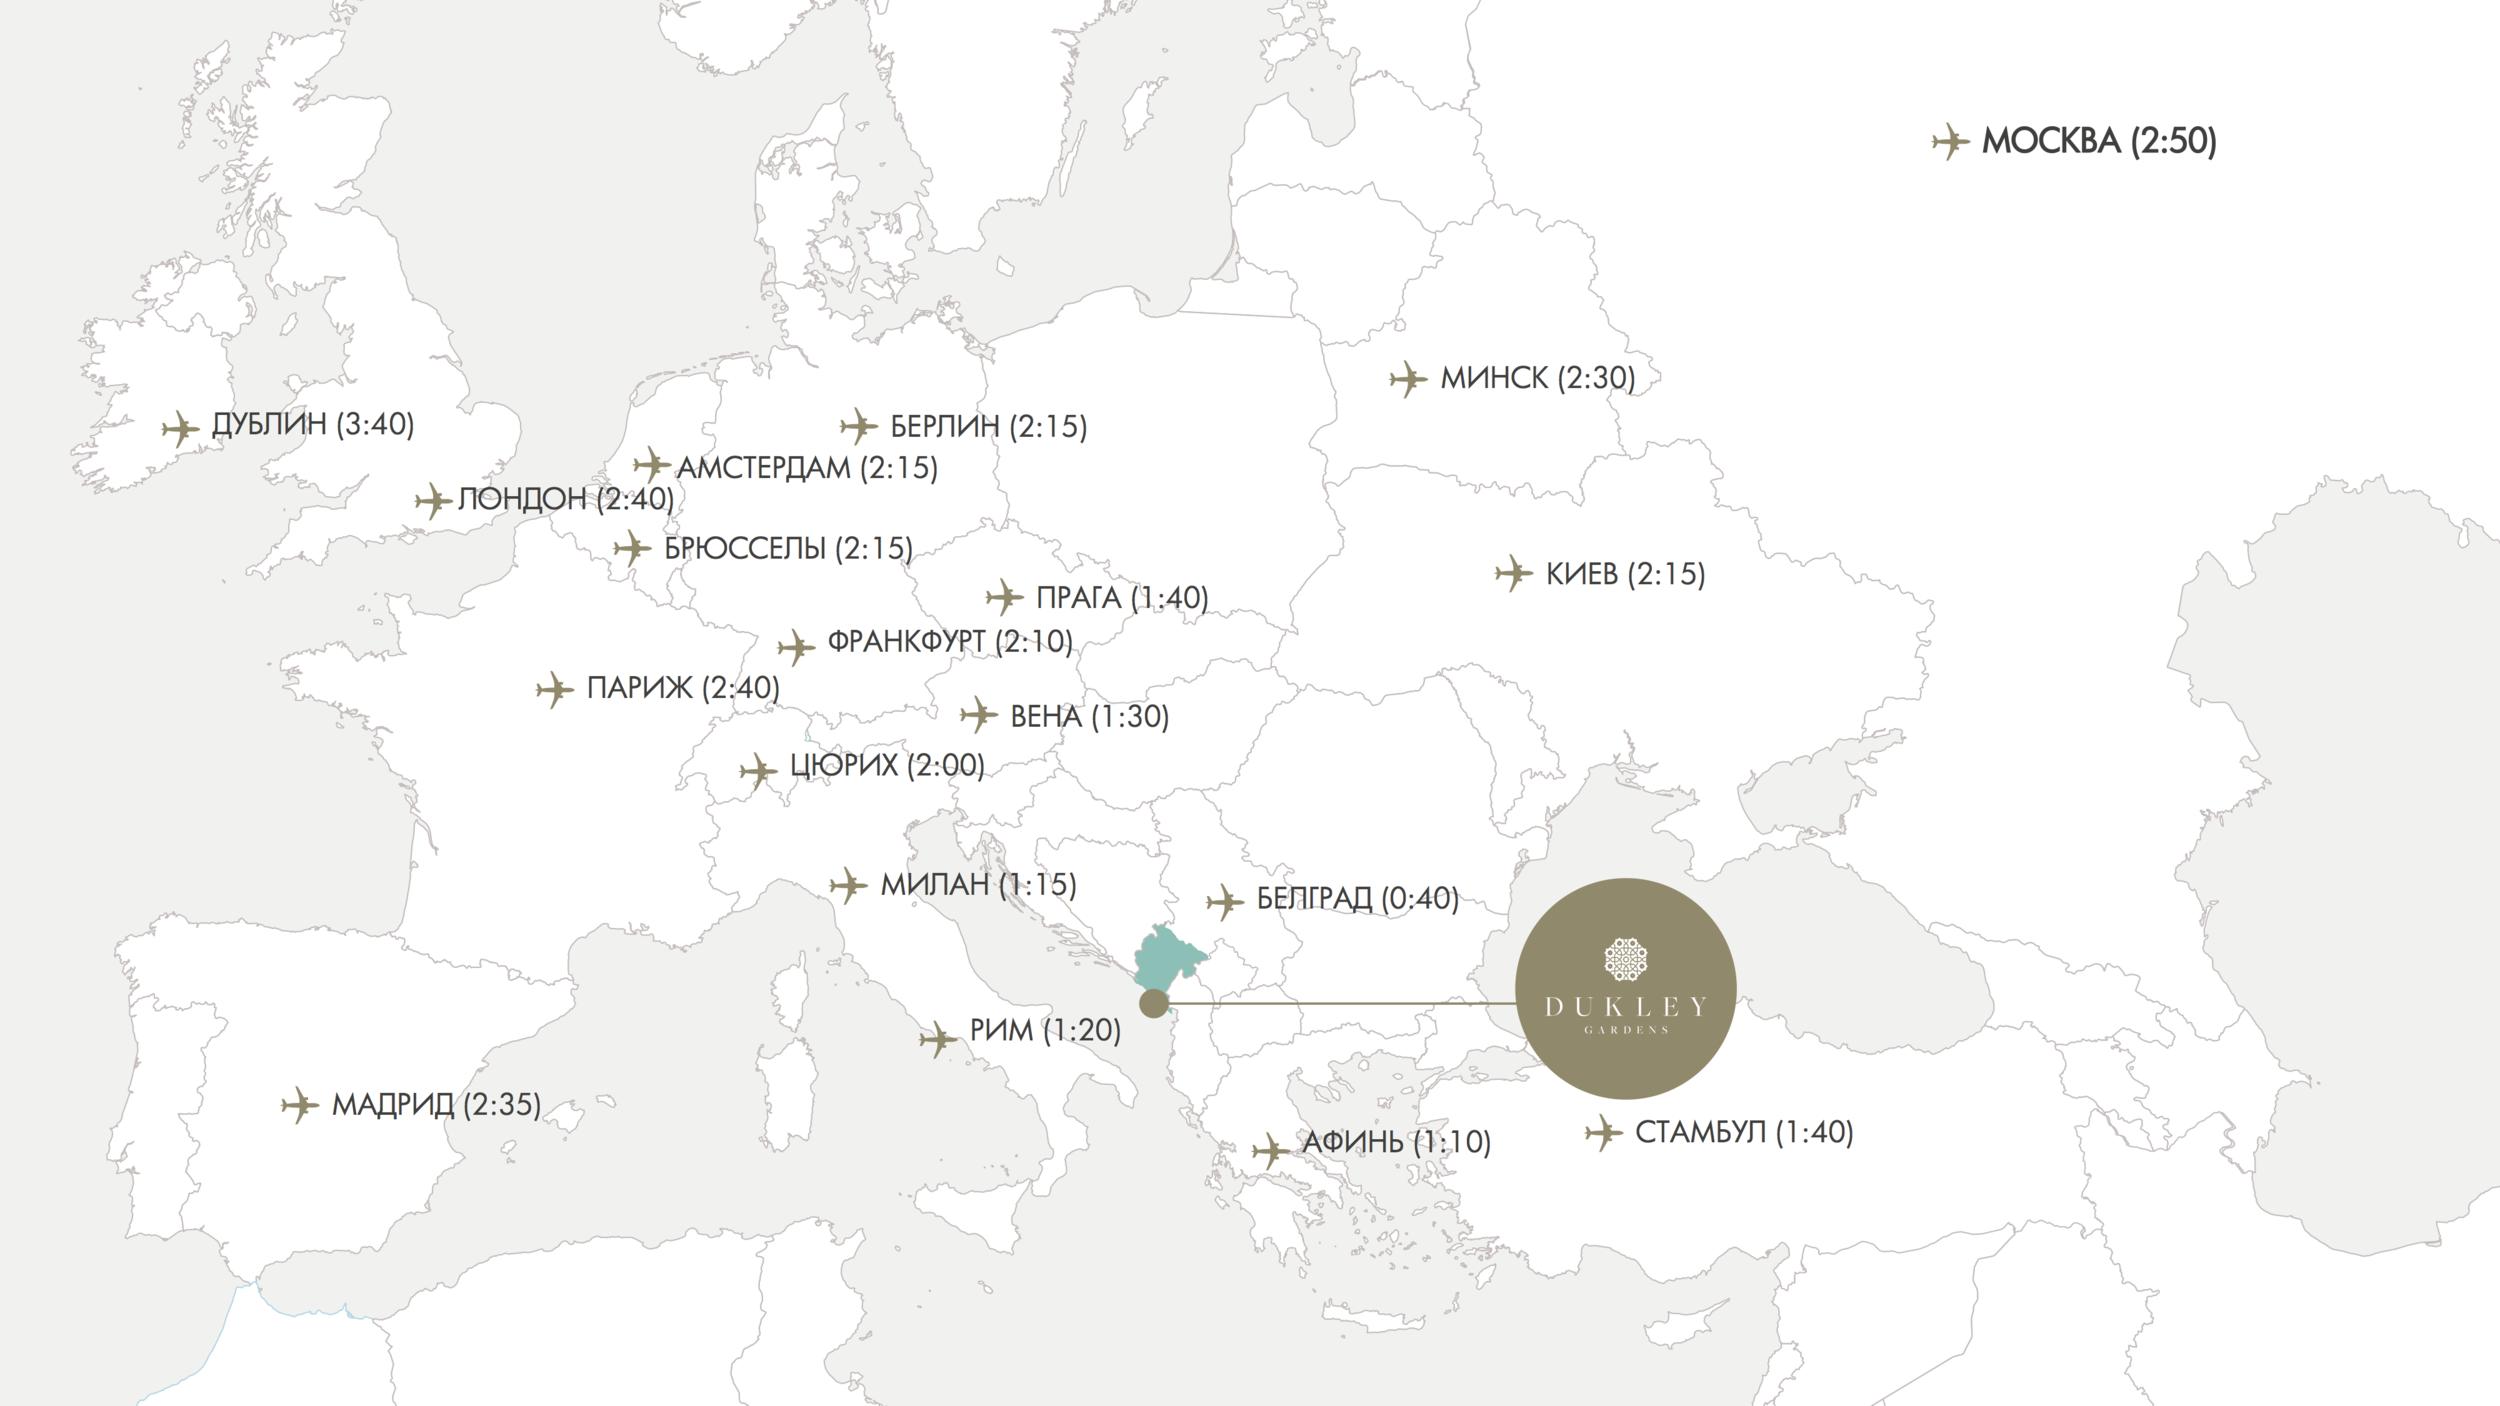 DUKLEY MAPS (перетянутый).png